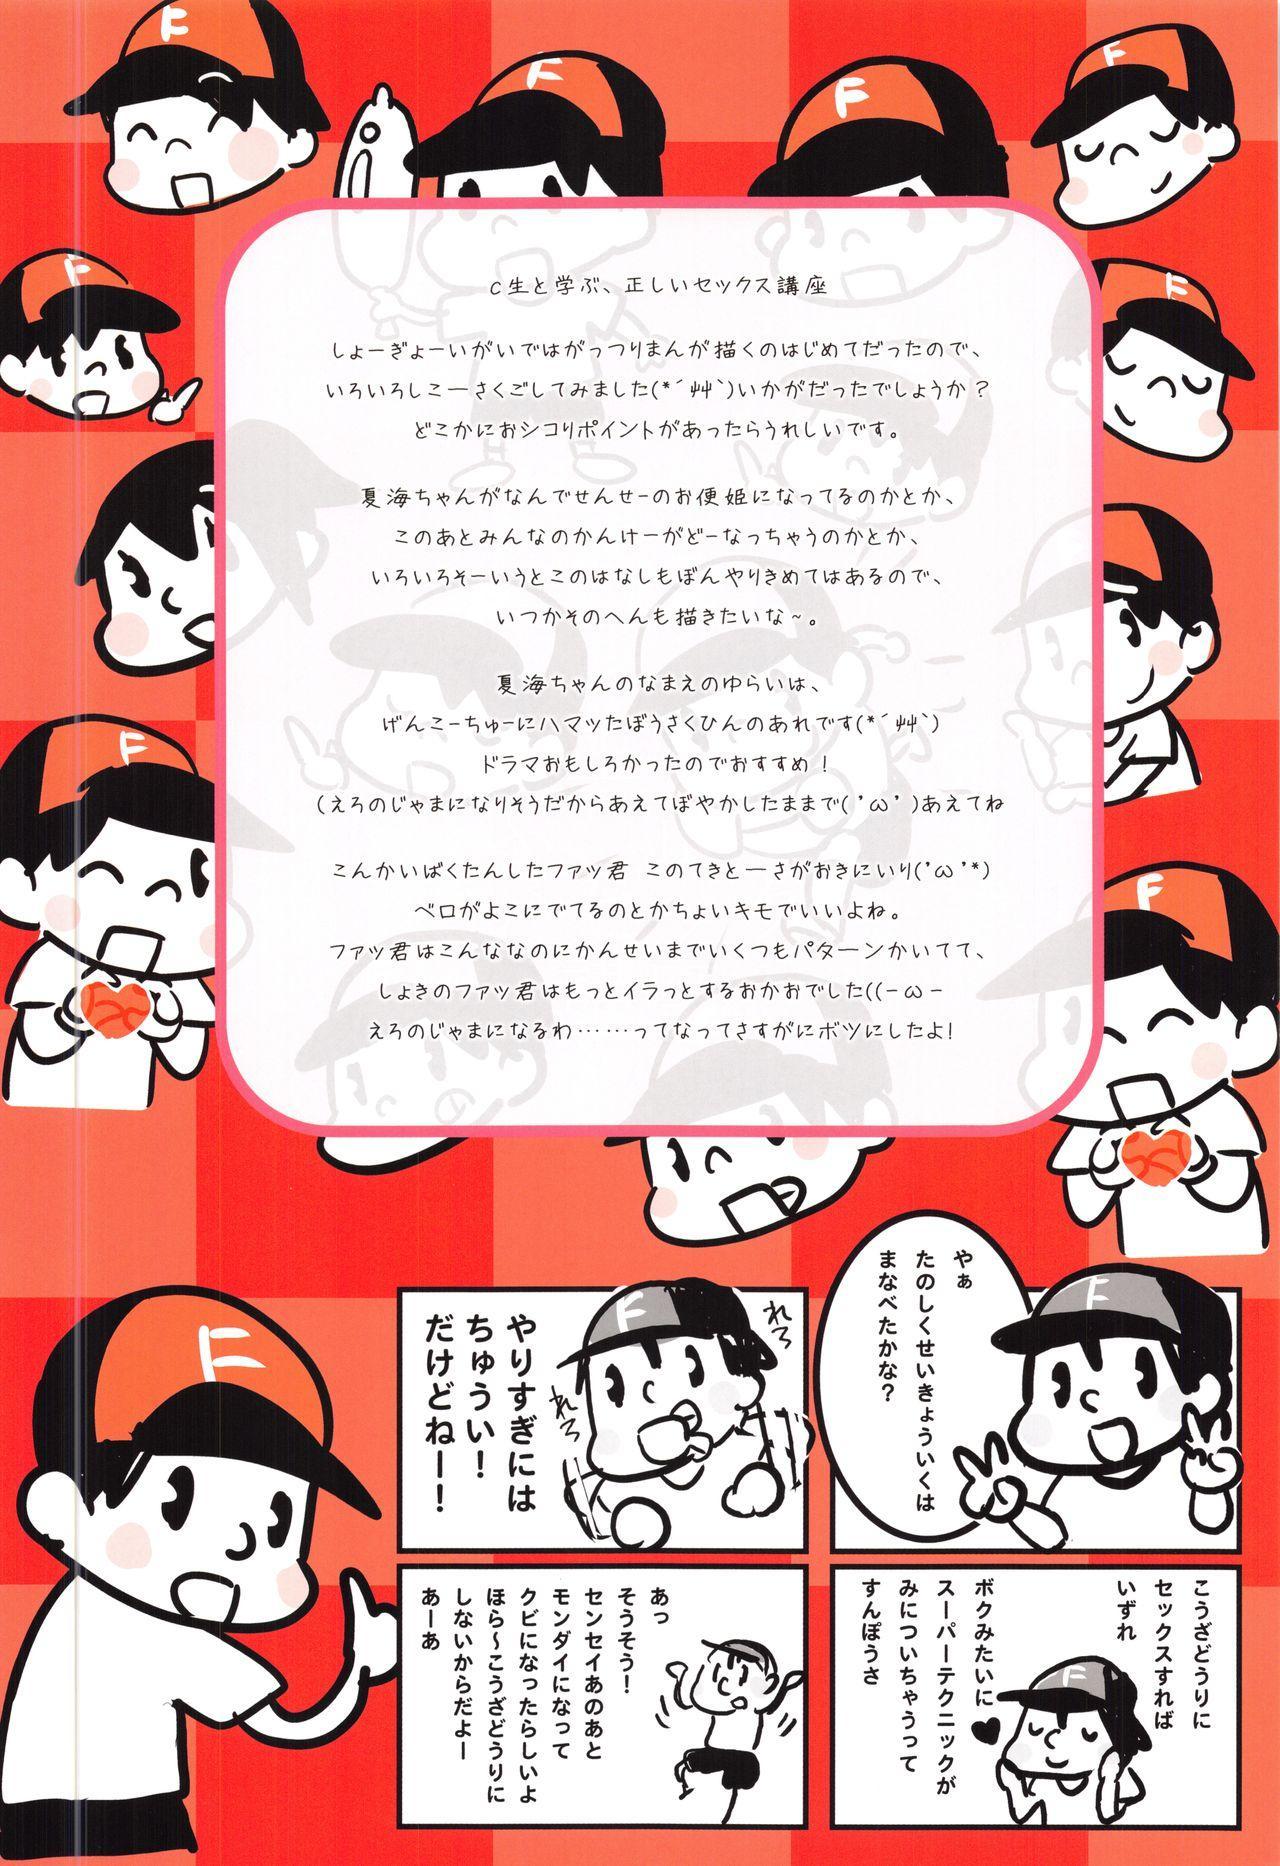 [Peromex (Tamanoi Peromekuri)] ©-sei de Manabu, Tadashii Sex Kouza | JC Hands-On Proper Sex Lecture [English] [bientaimon] [2019-11-09] 32